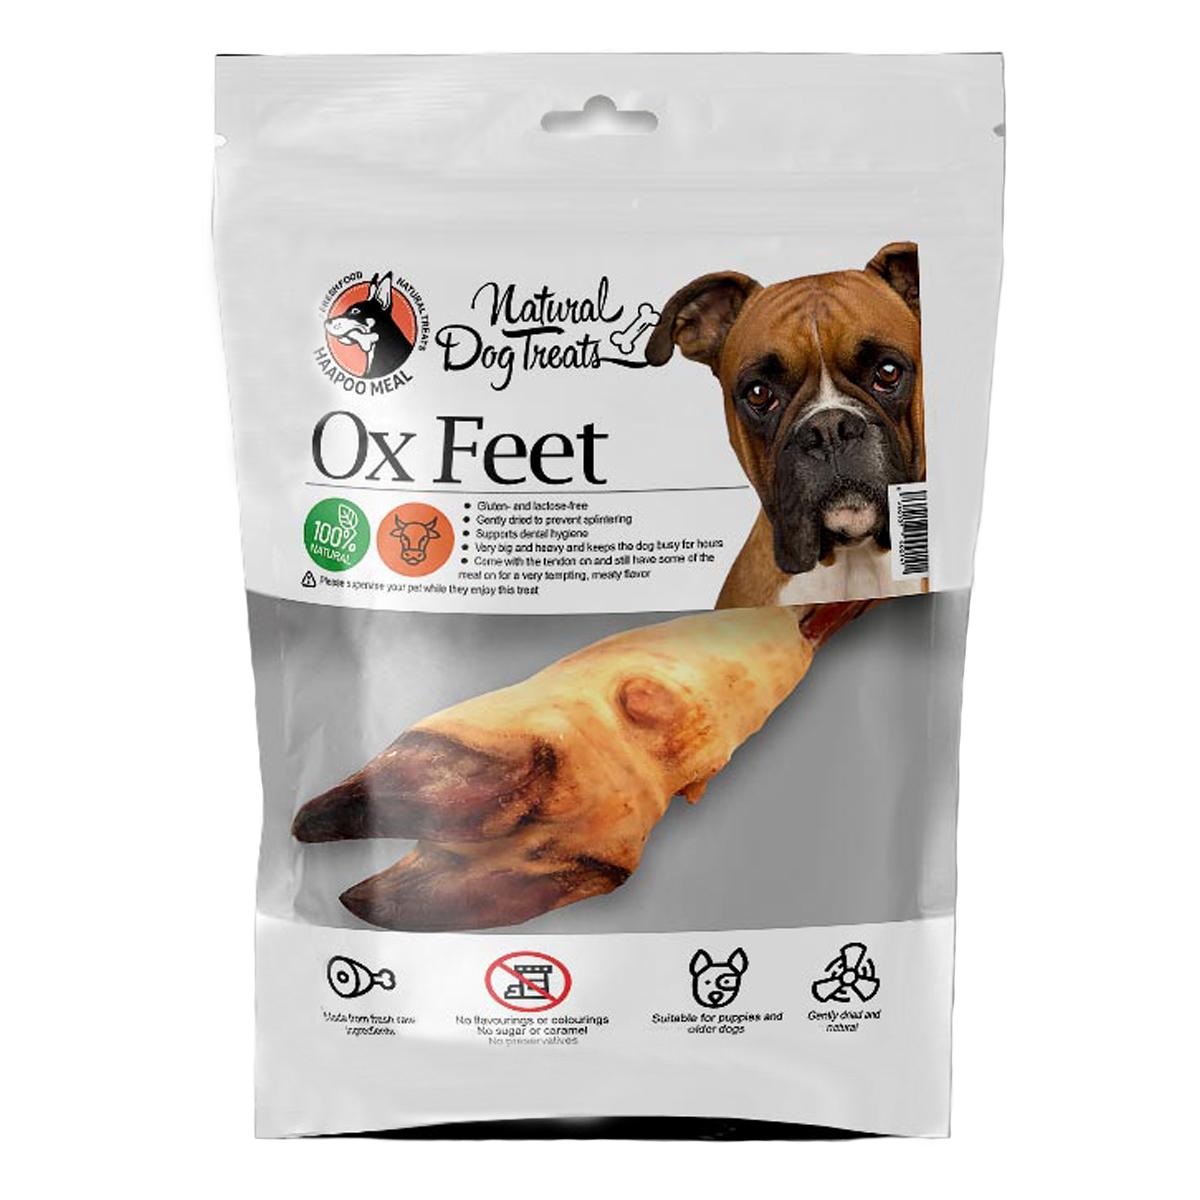 غذای تشویقی سگ هاپومیل مدل Ox Feet کد 66 وزن 250 گرم